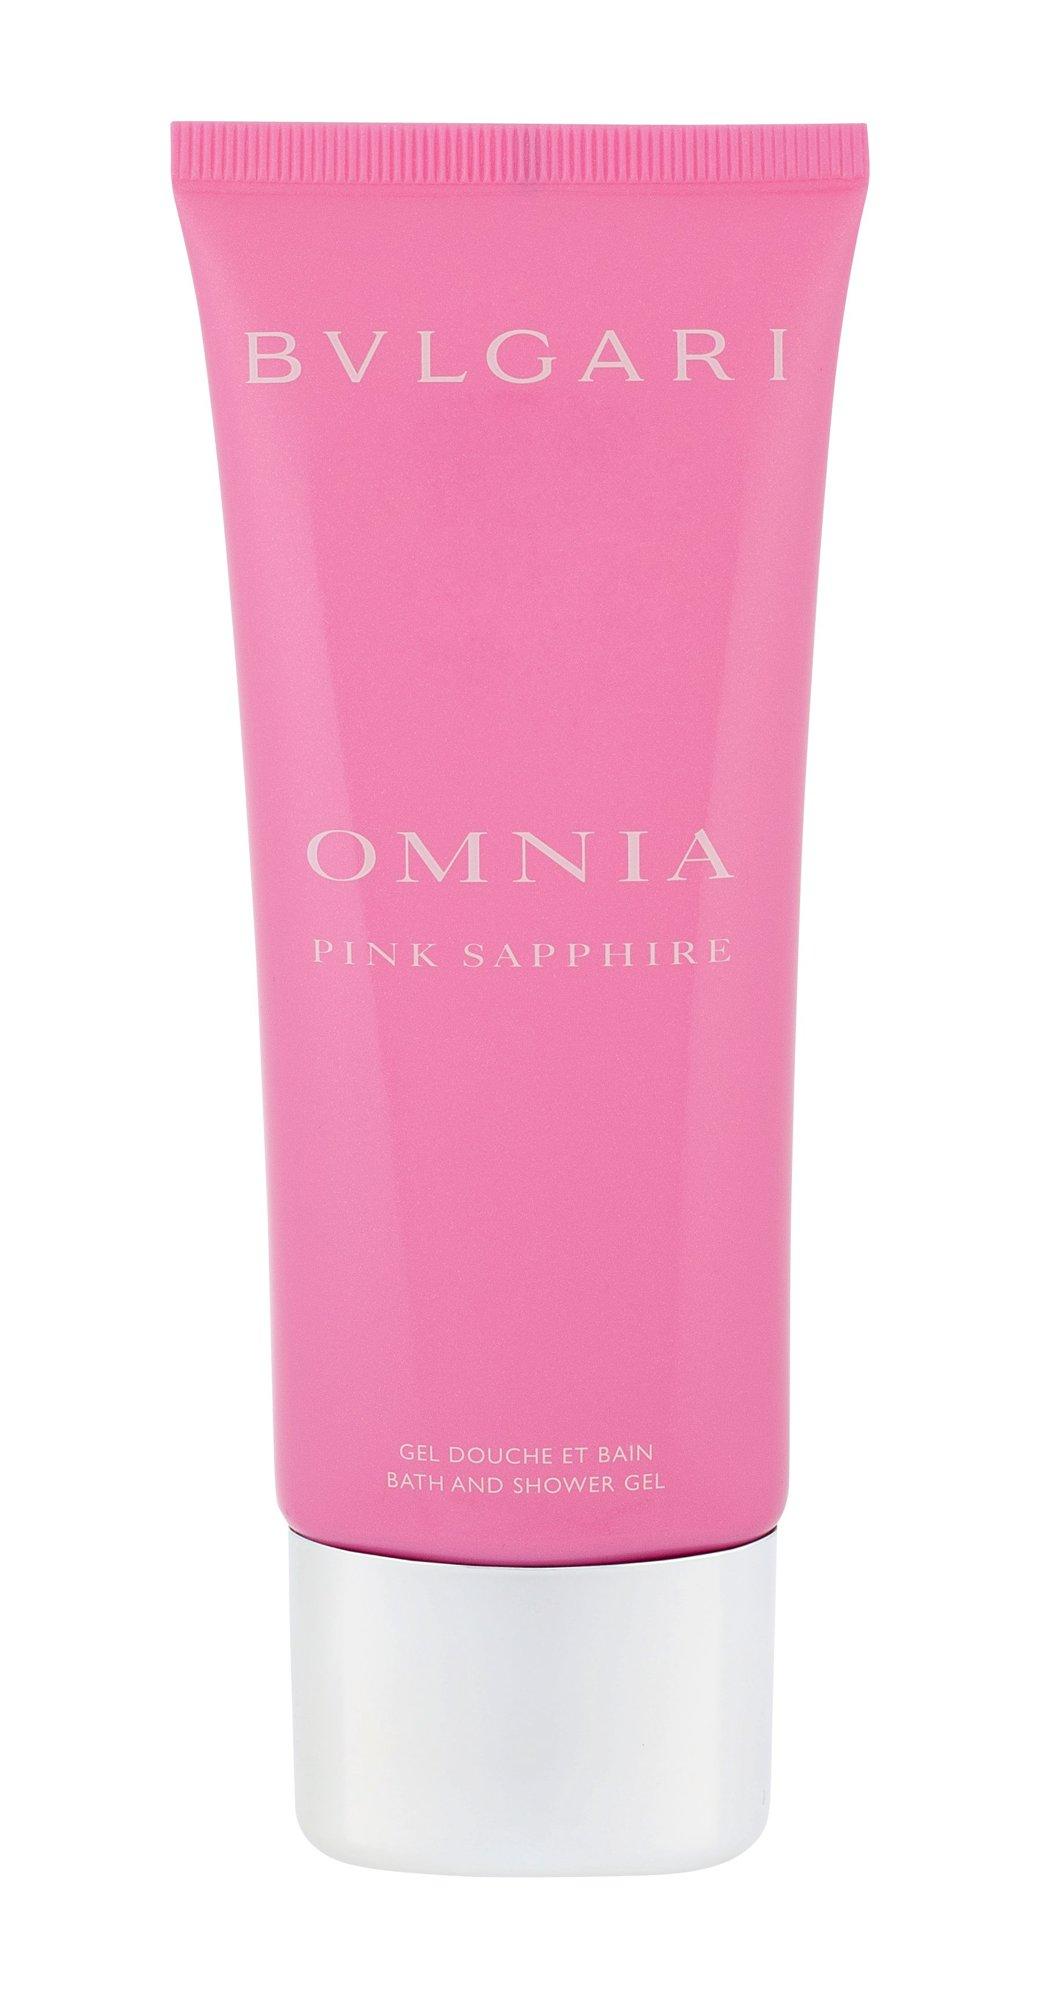 Bvlgari Omnia Pink Sapphire Shower Gel 100ml